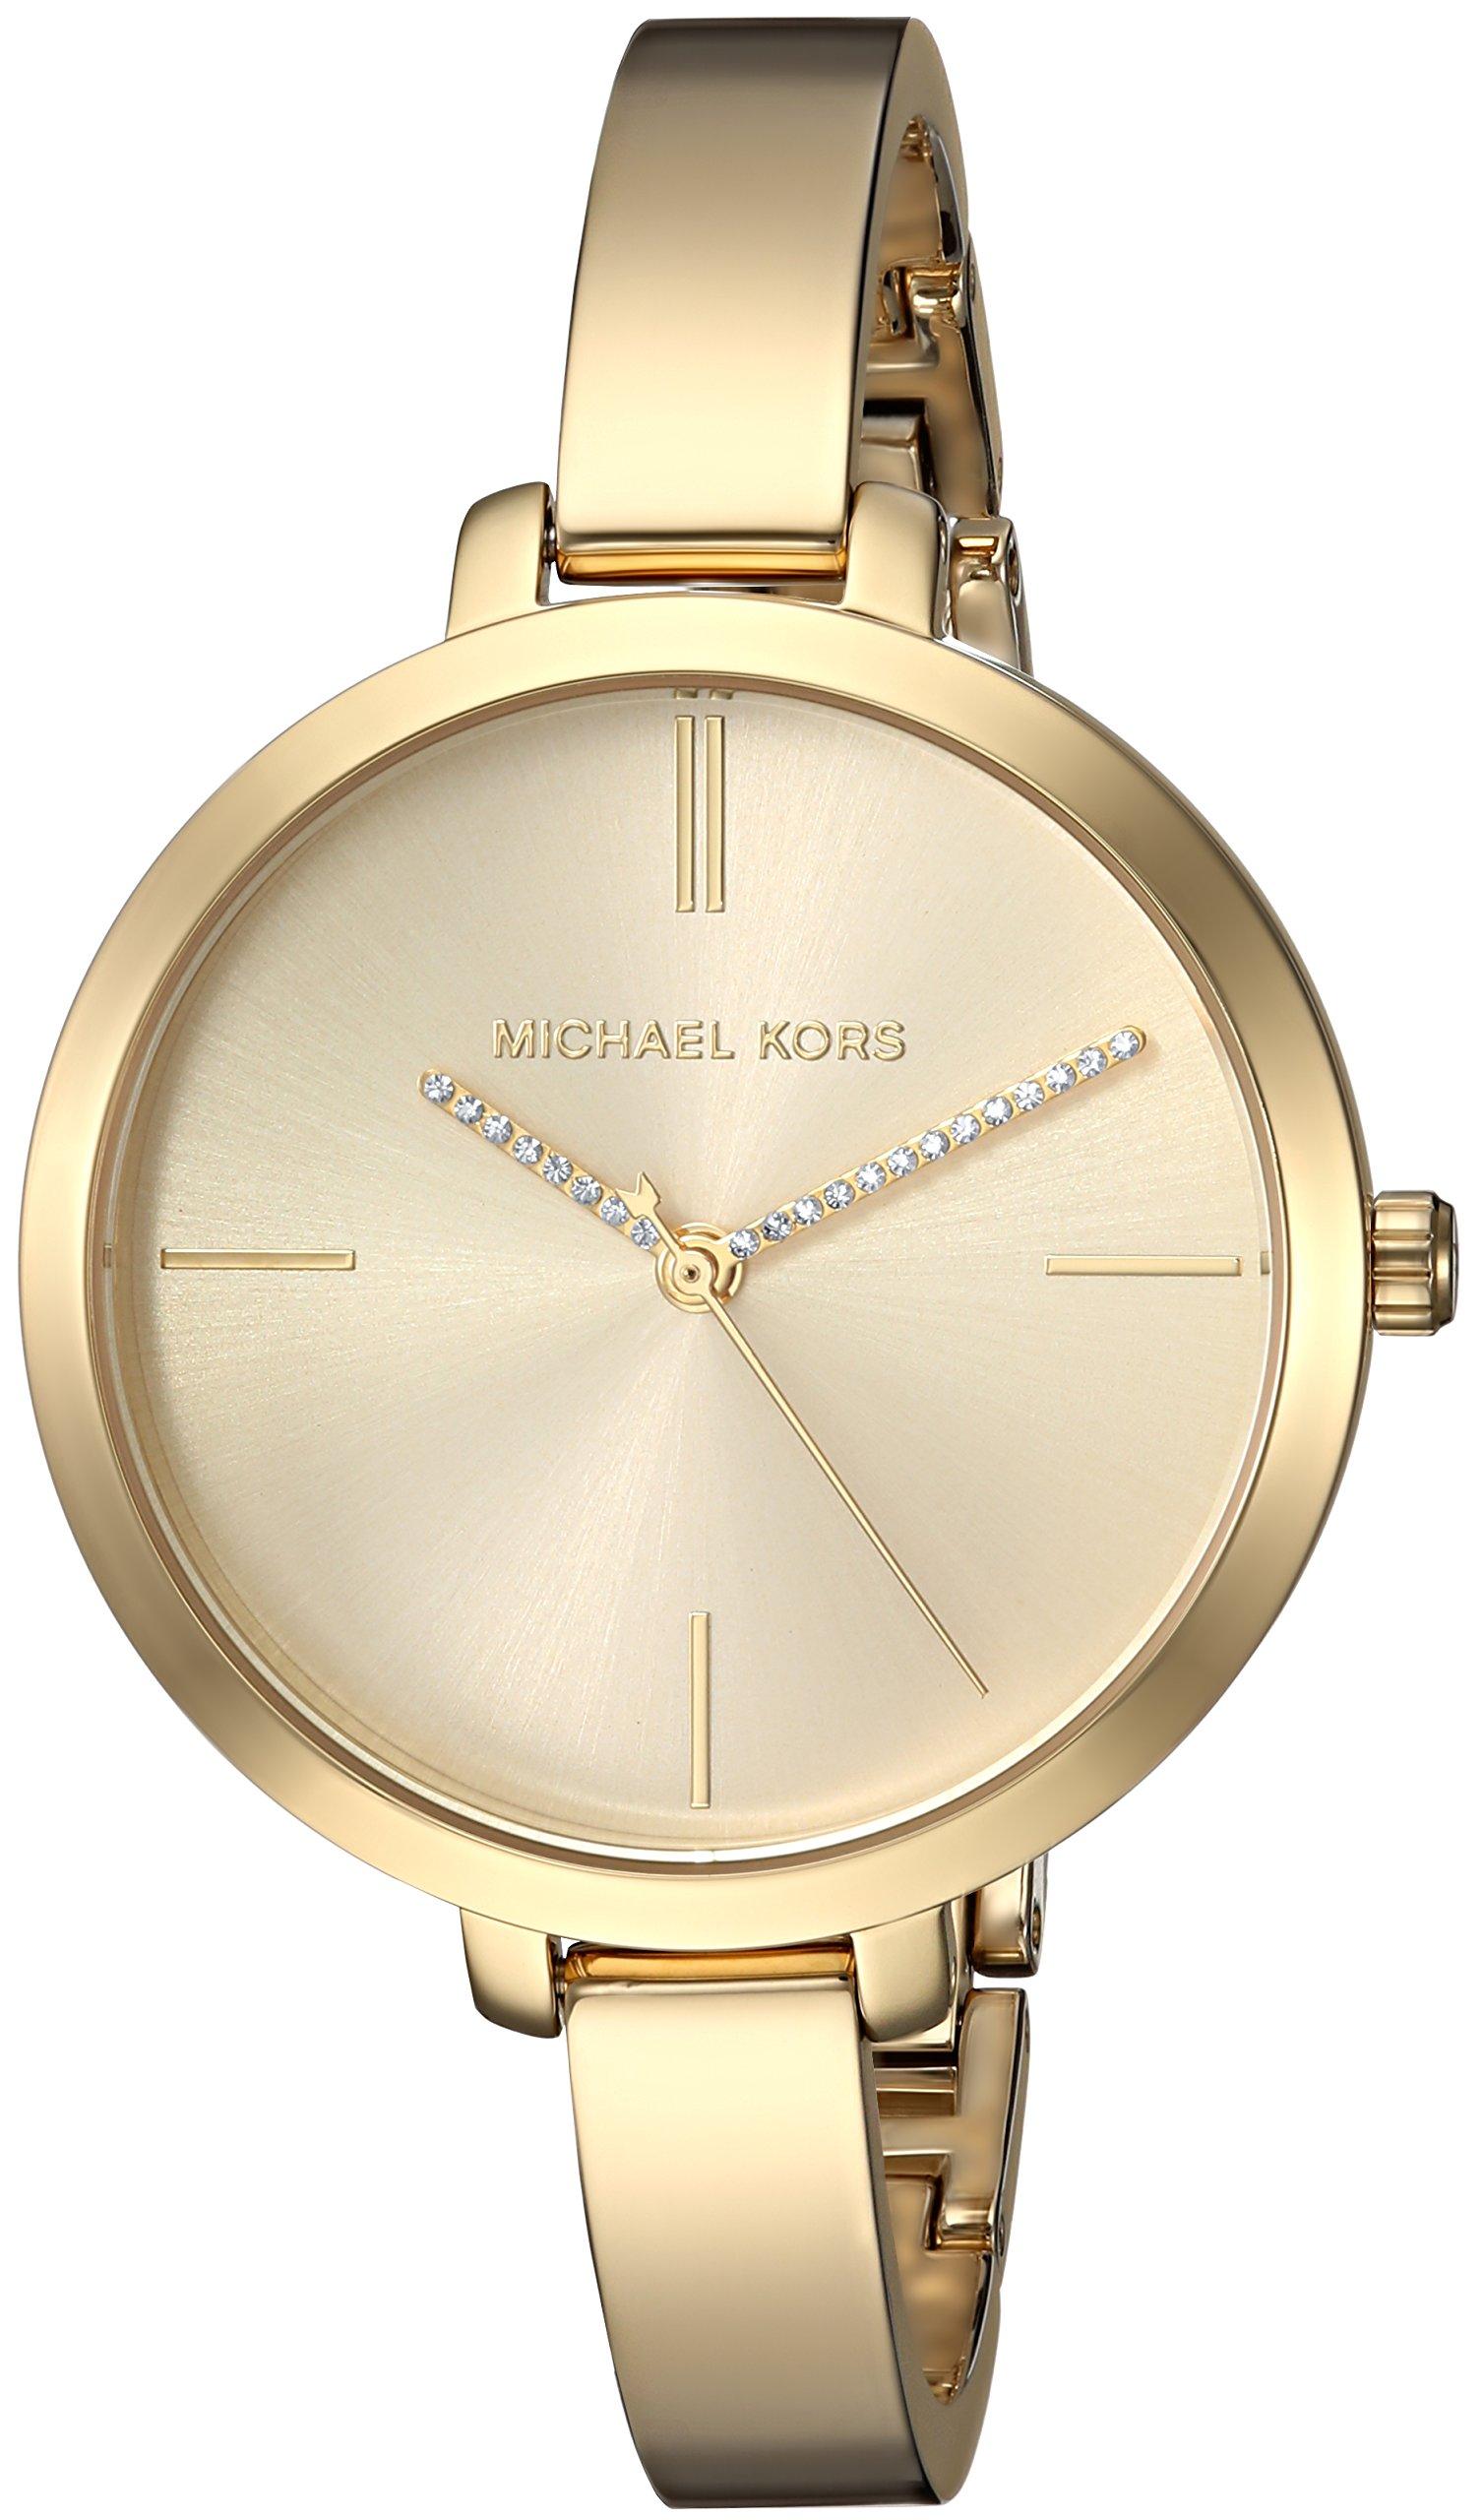 Michael Kors Women's 'Jaryn' Quartz Stainless Steel Casual Watch, Color:Gold-Toned (Model: MK3734)